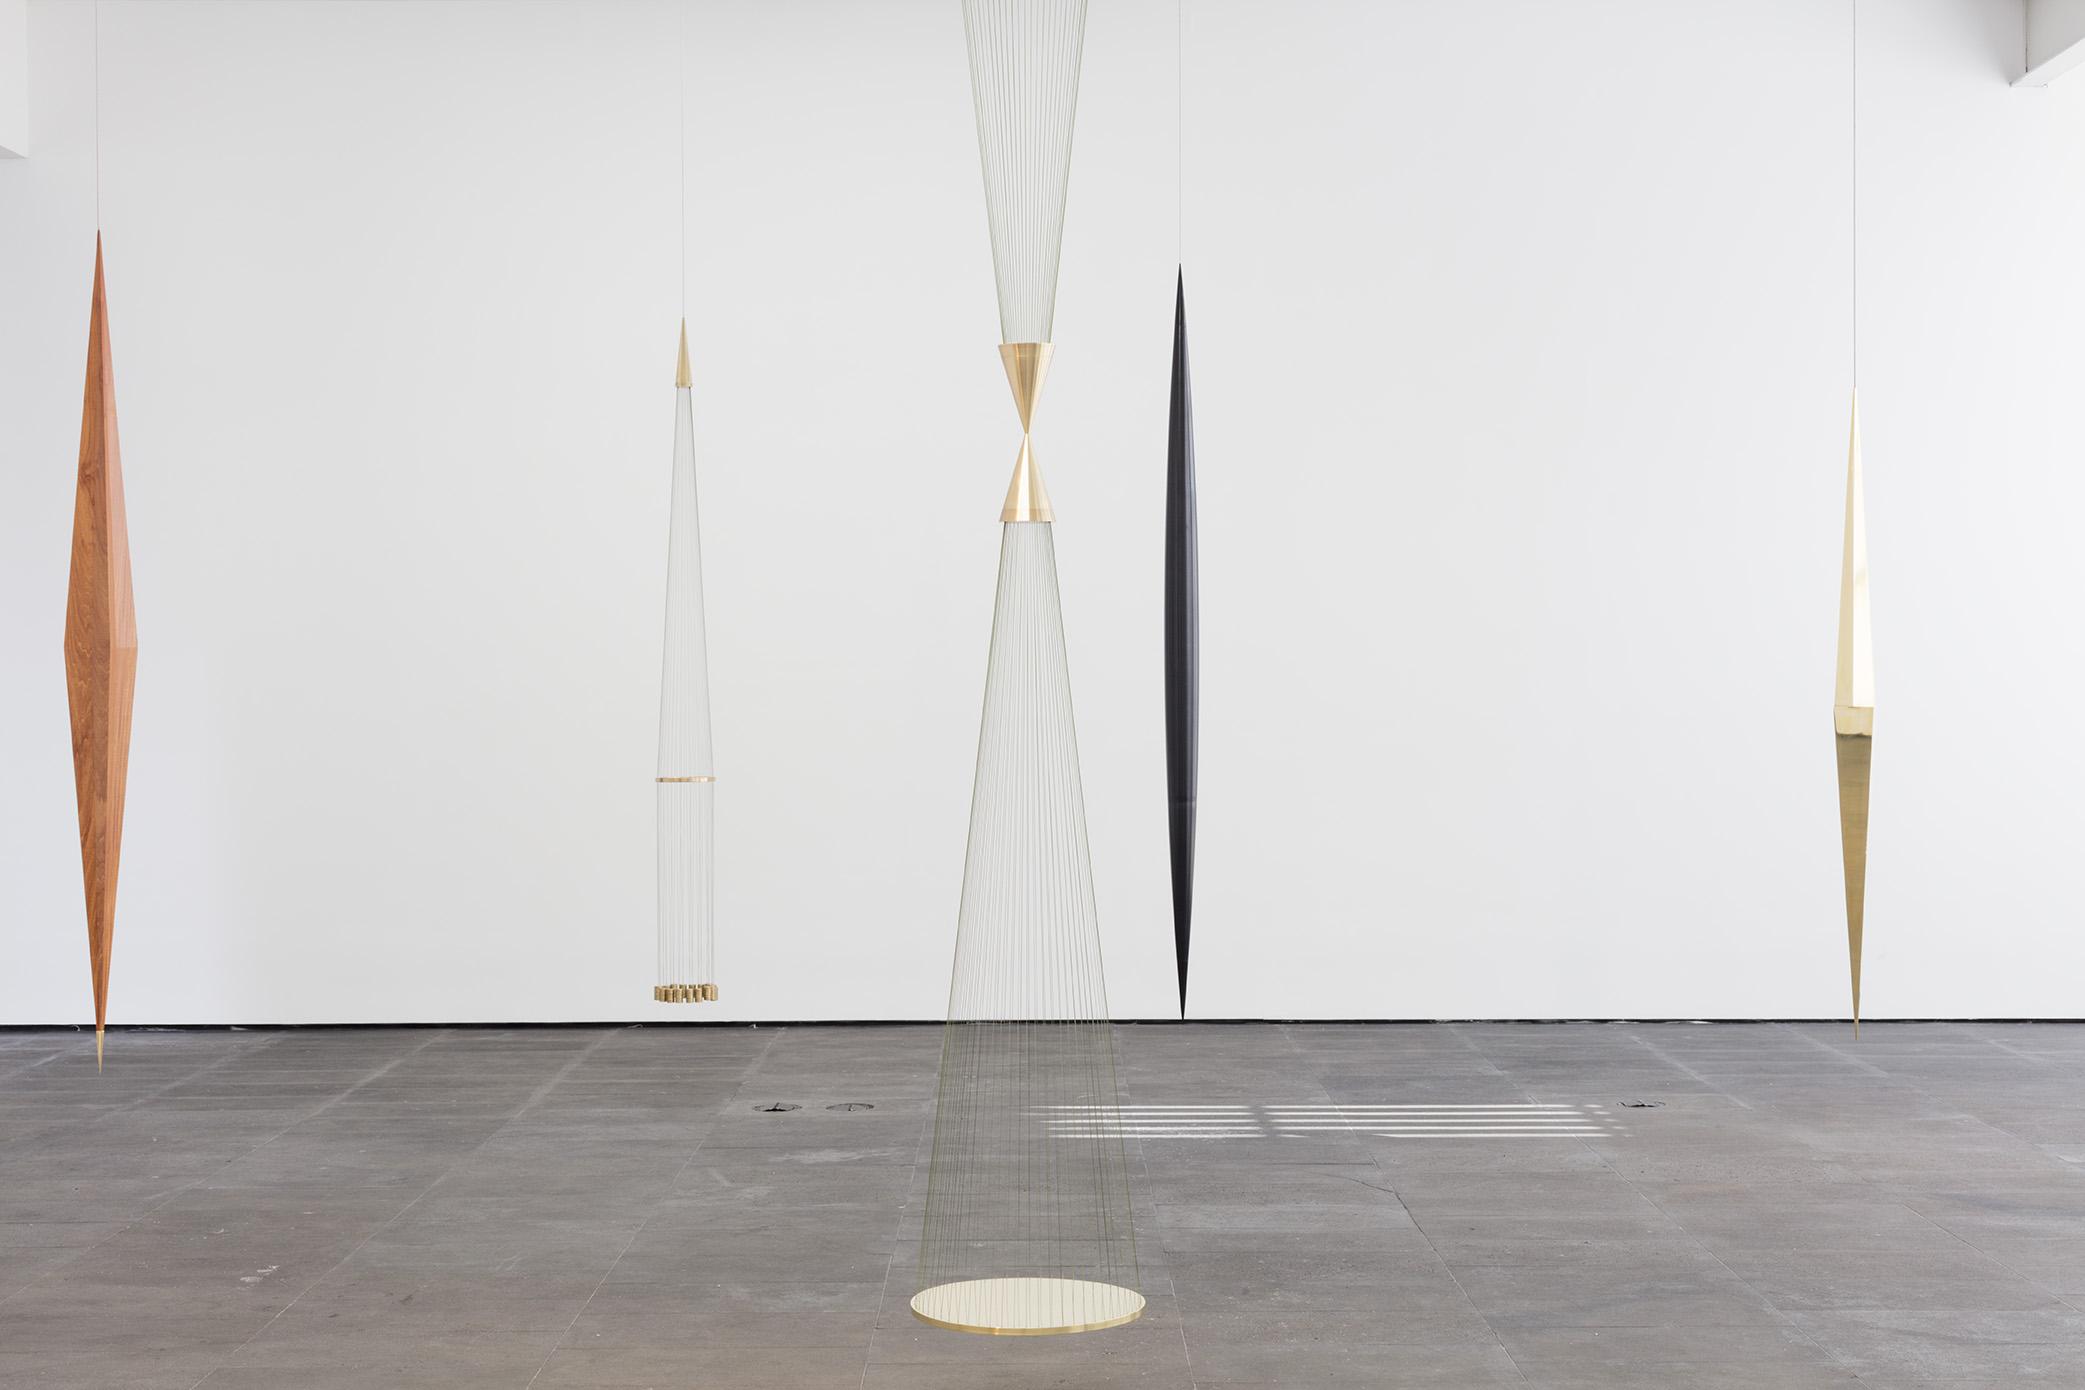 15. Asterismos, Artur Lescher, 2018. Galería OMR, Mexico City. Image: Enrique Macías. Courtesy of Galería OMR.